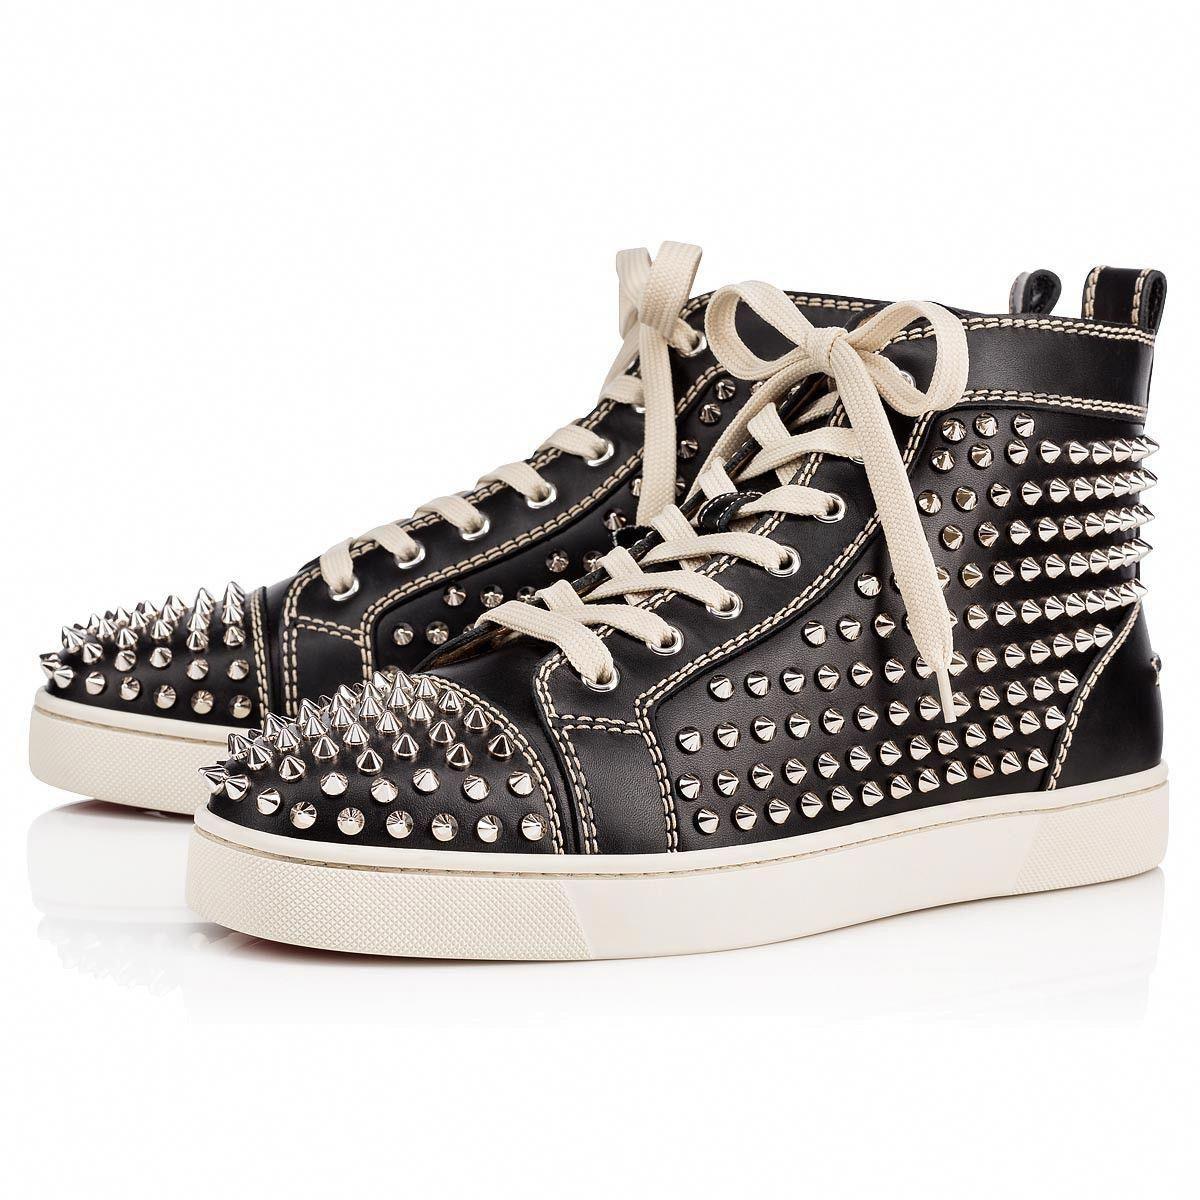 383e1c5258b Men Shoes - Louis Calf - Christian Louboutin #ChristianLouboutin ...